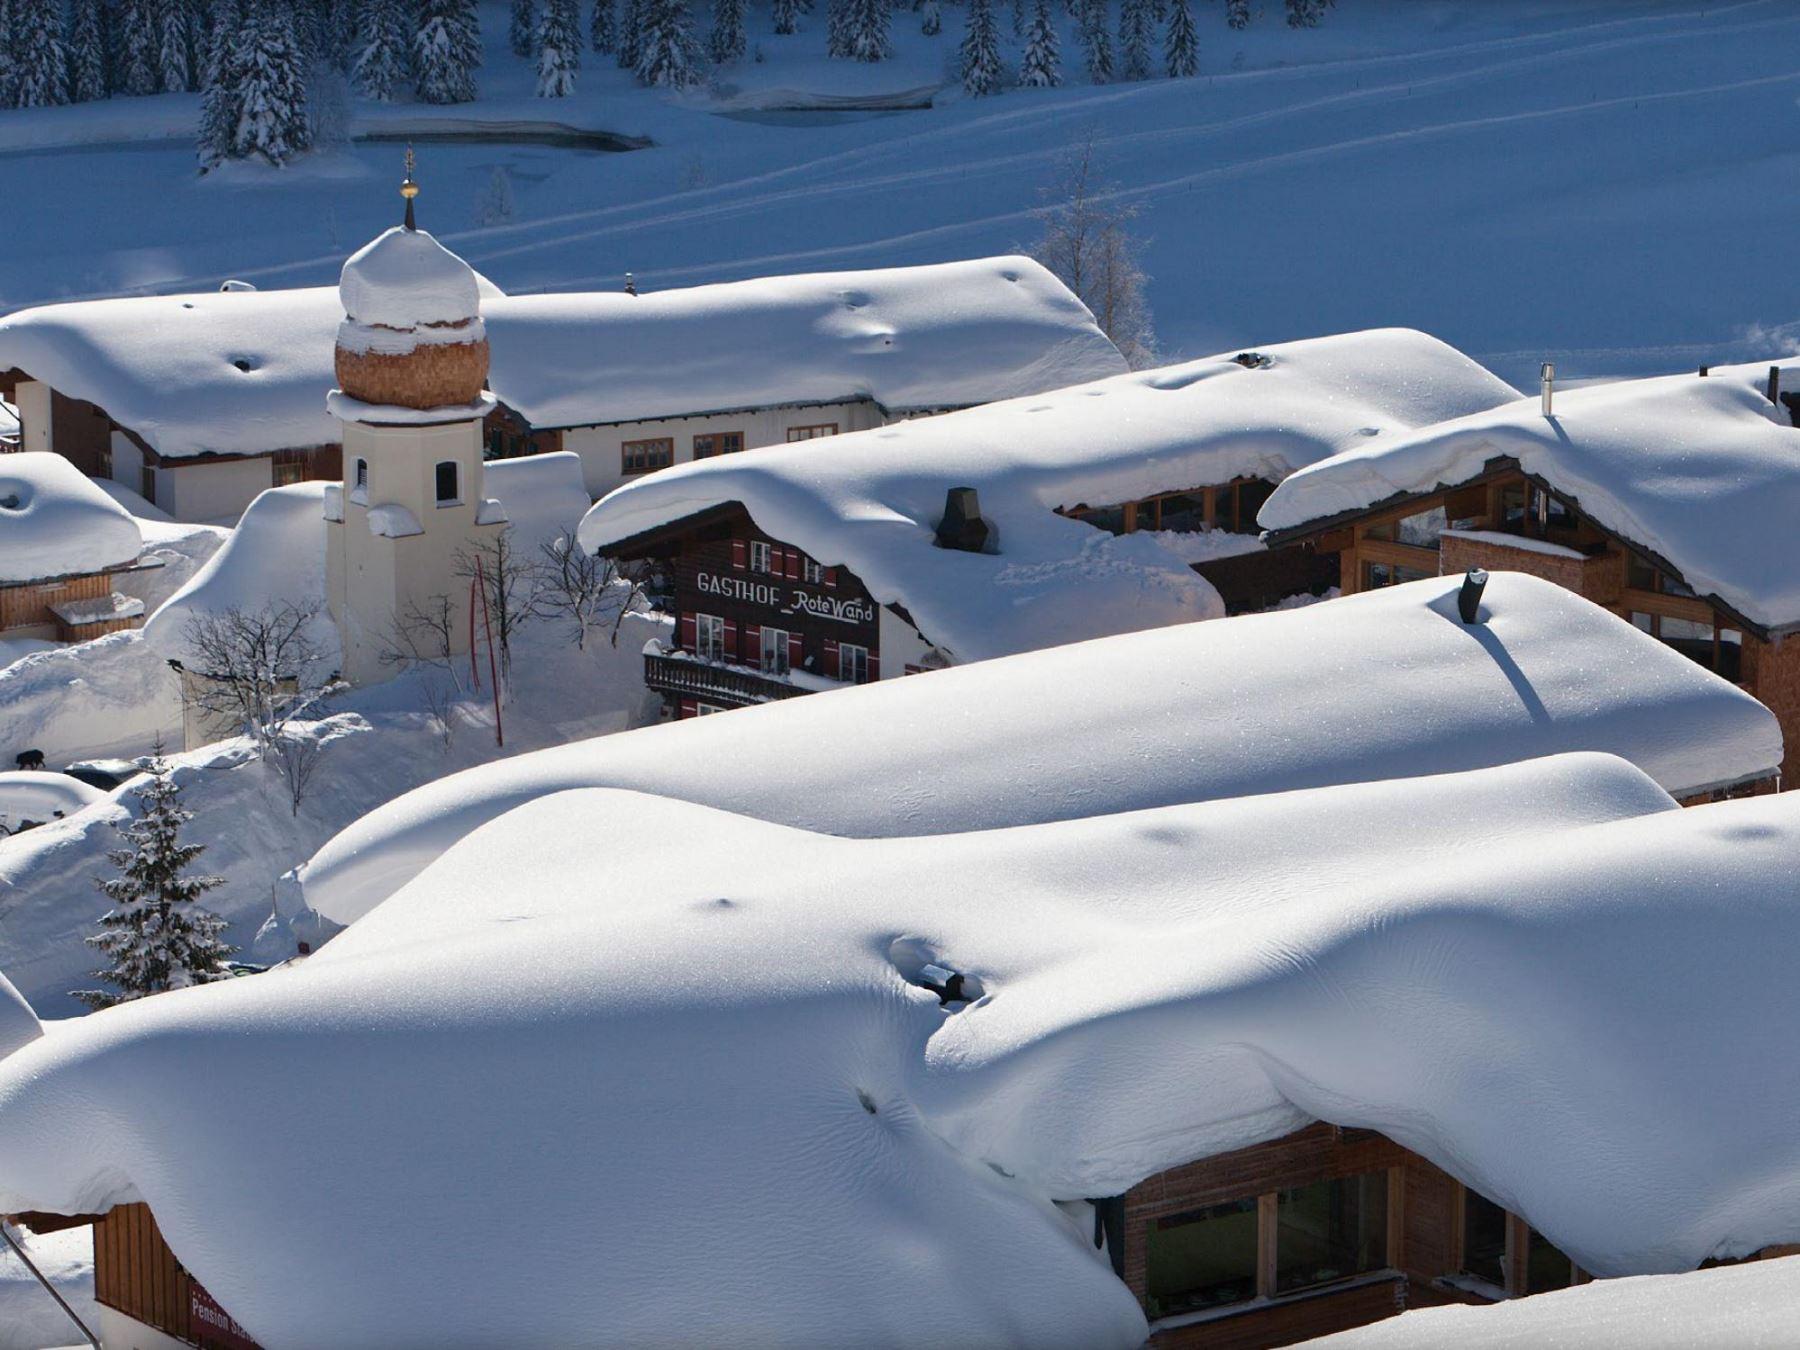 Gourmet Hotel Rote Wand in Lech am Arlberg, Ortsteil Zug